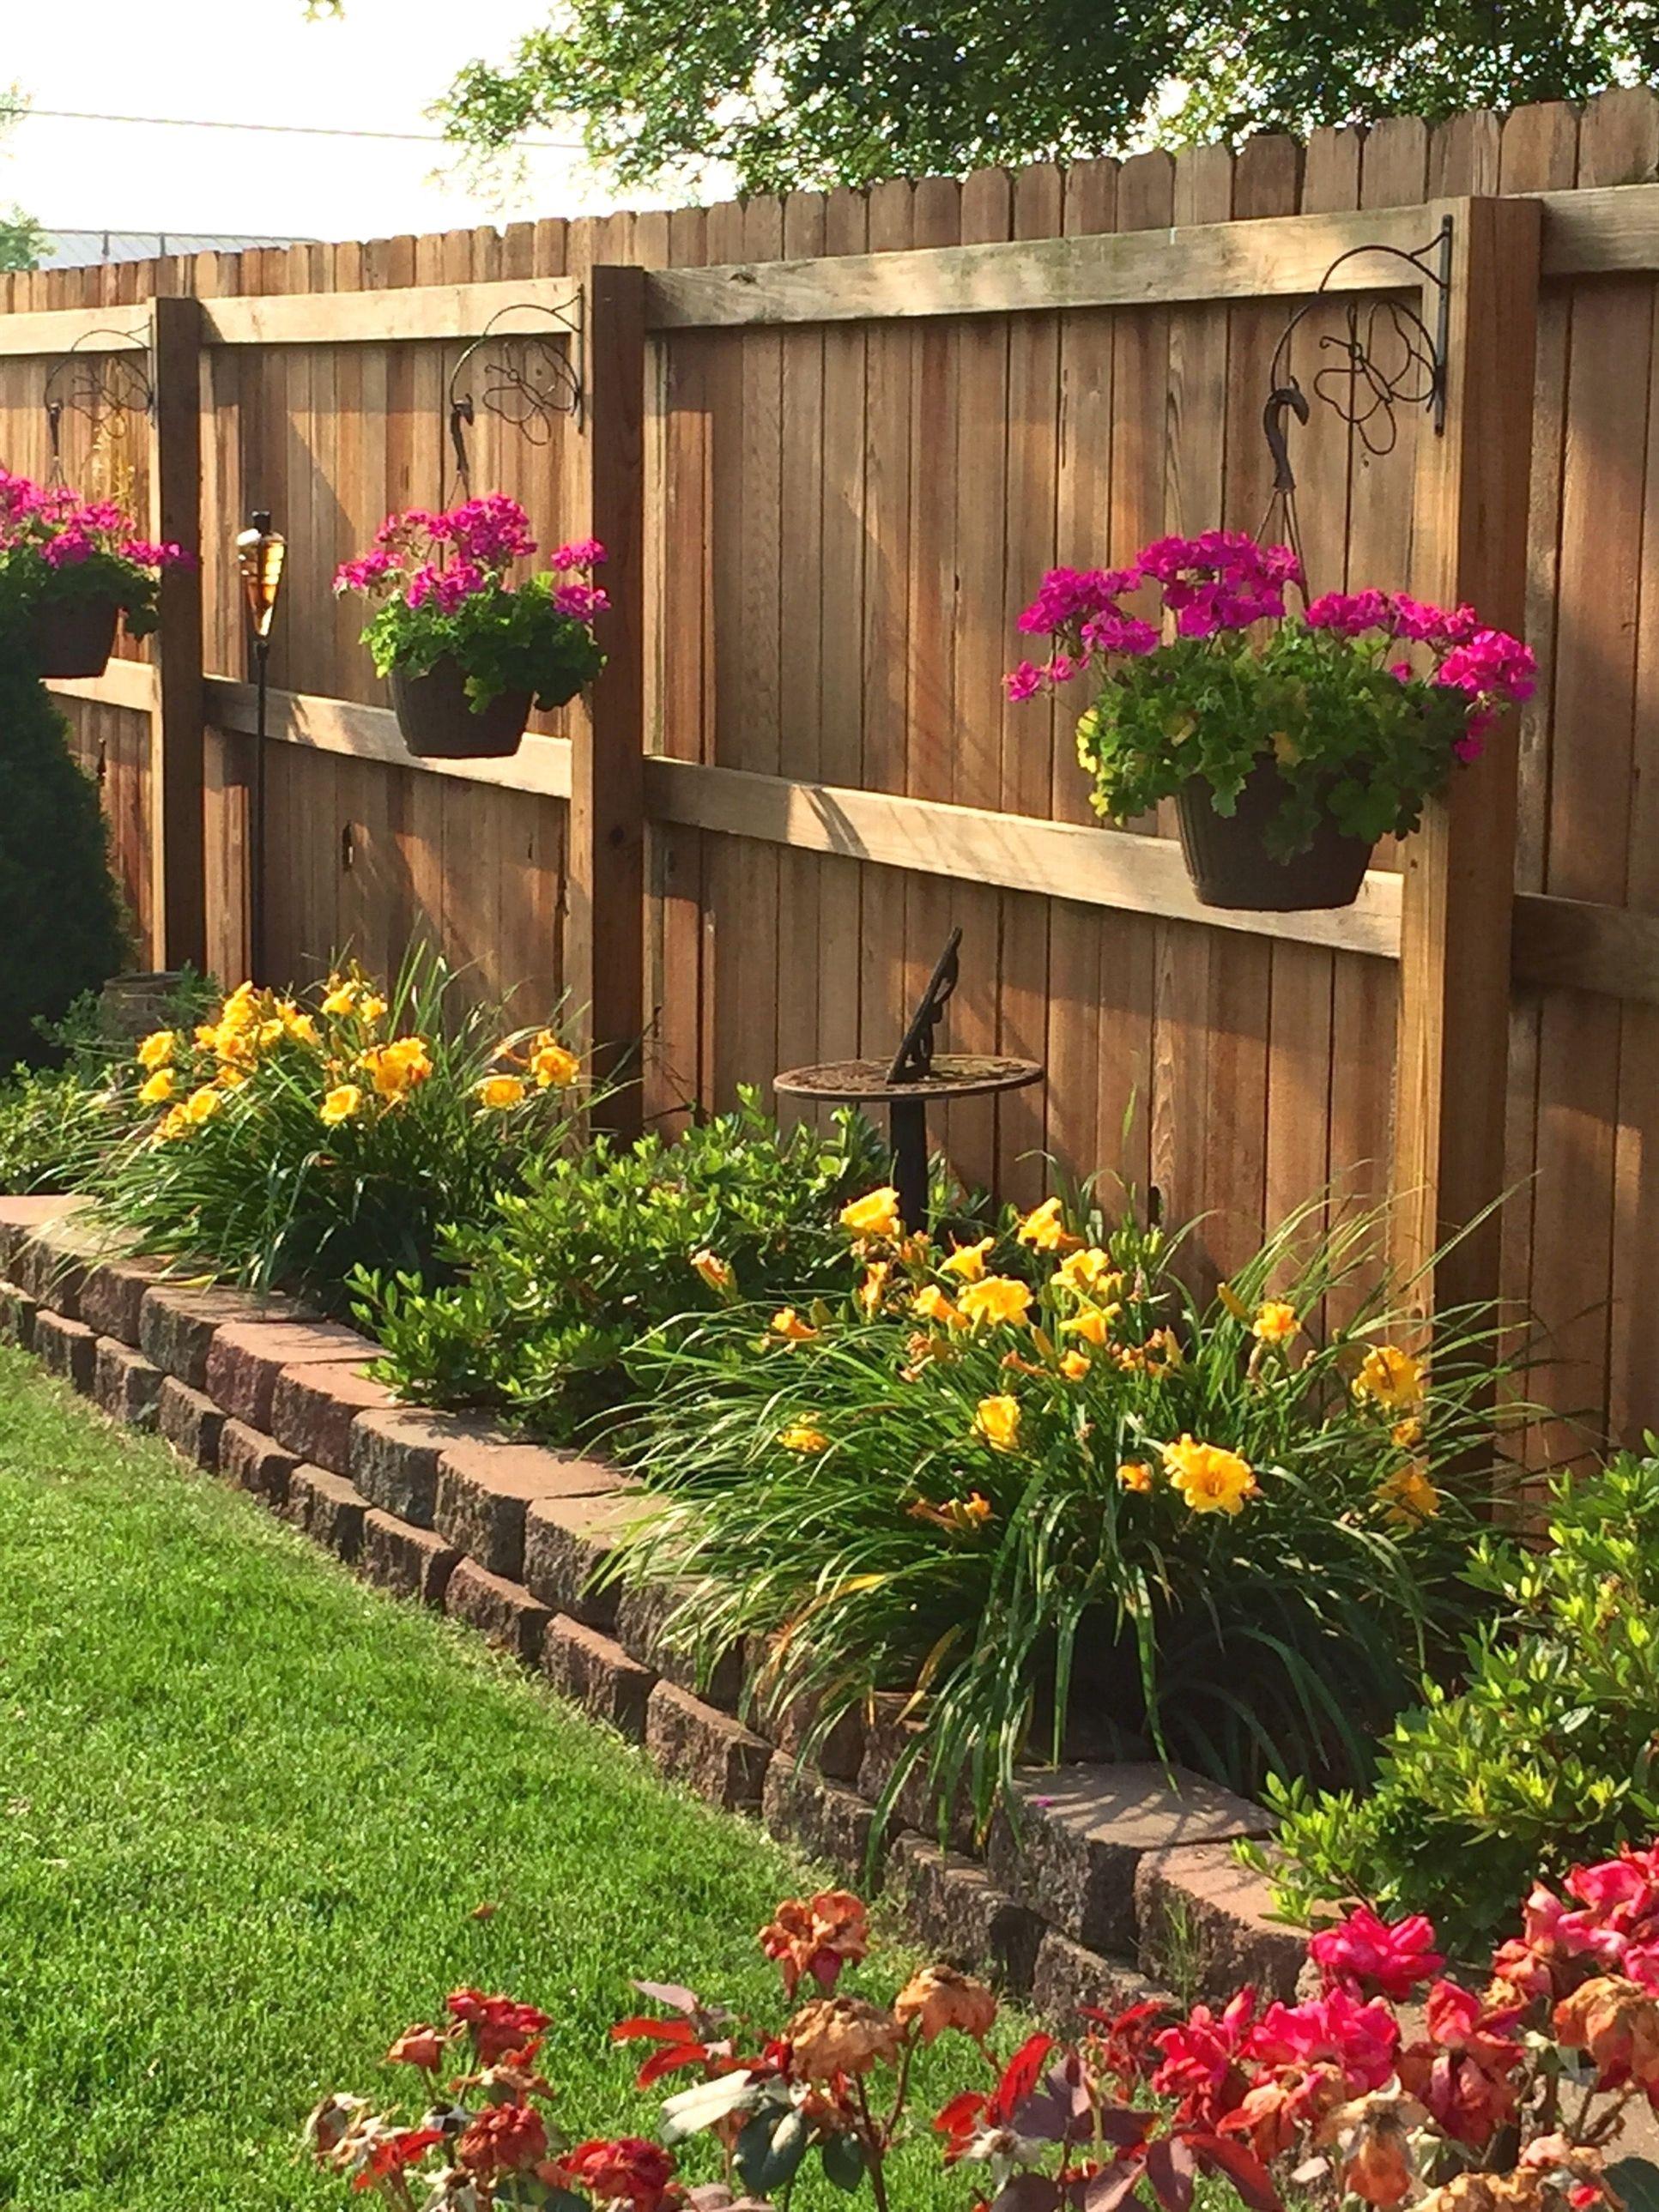 Why garden? | Small backyard landscaping, Garden yard ideas on Backyard Patio Designs On A Budget  id=30263